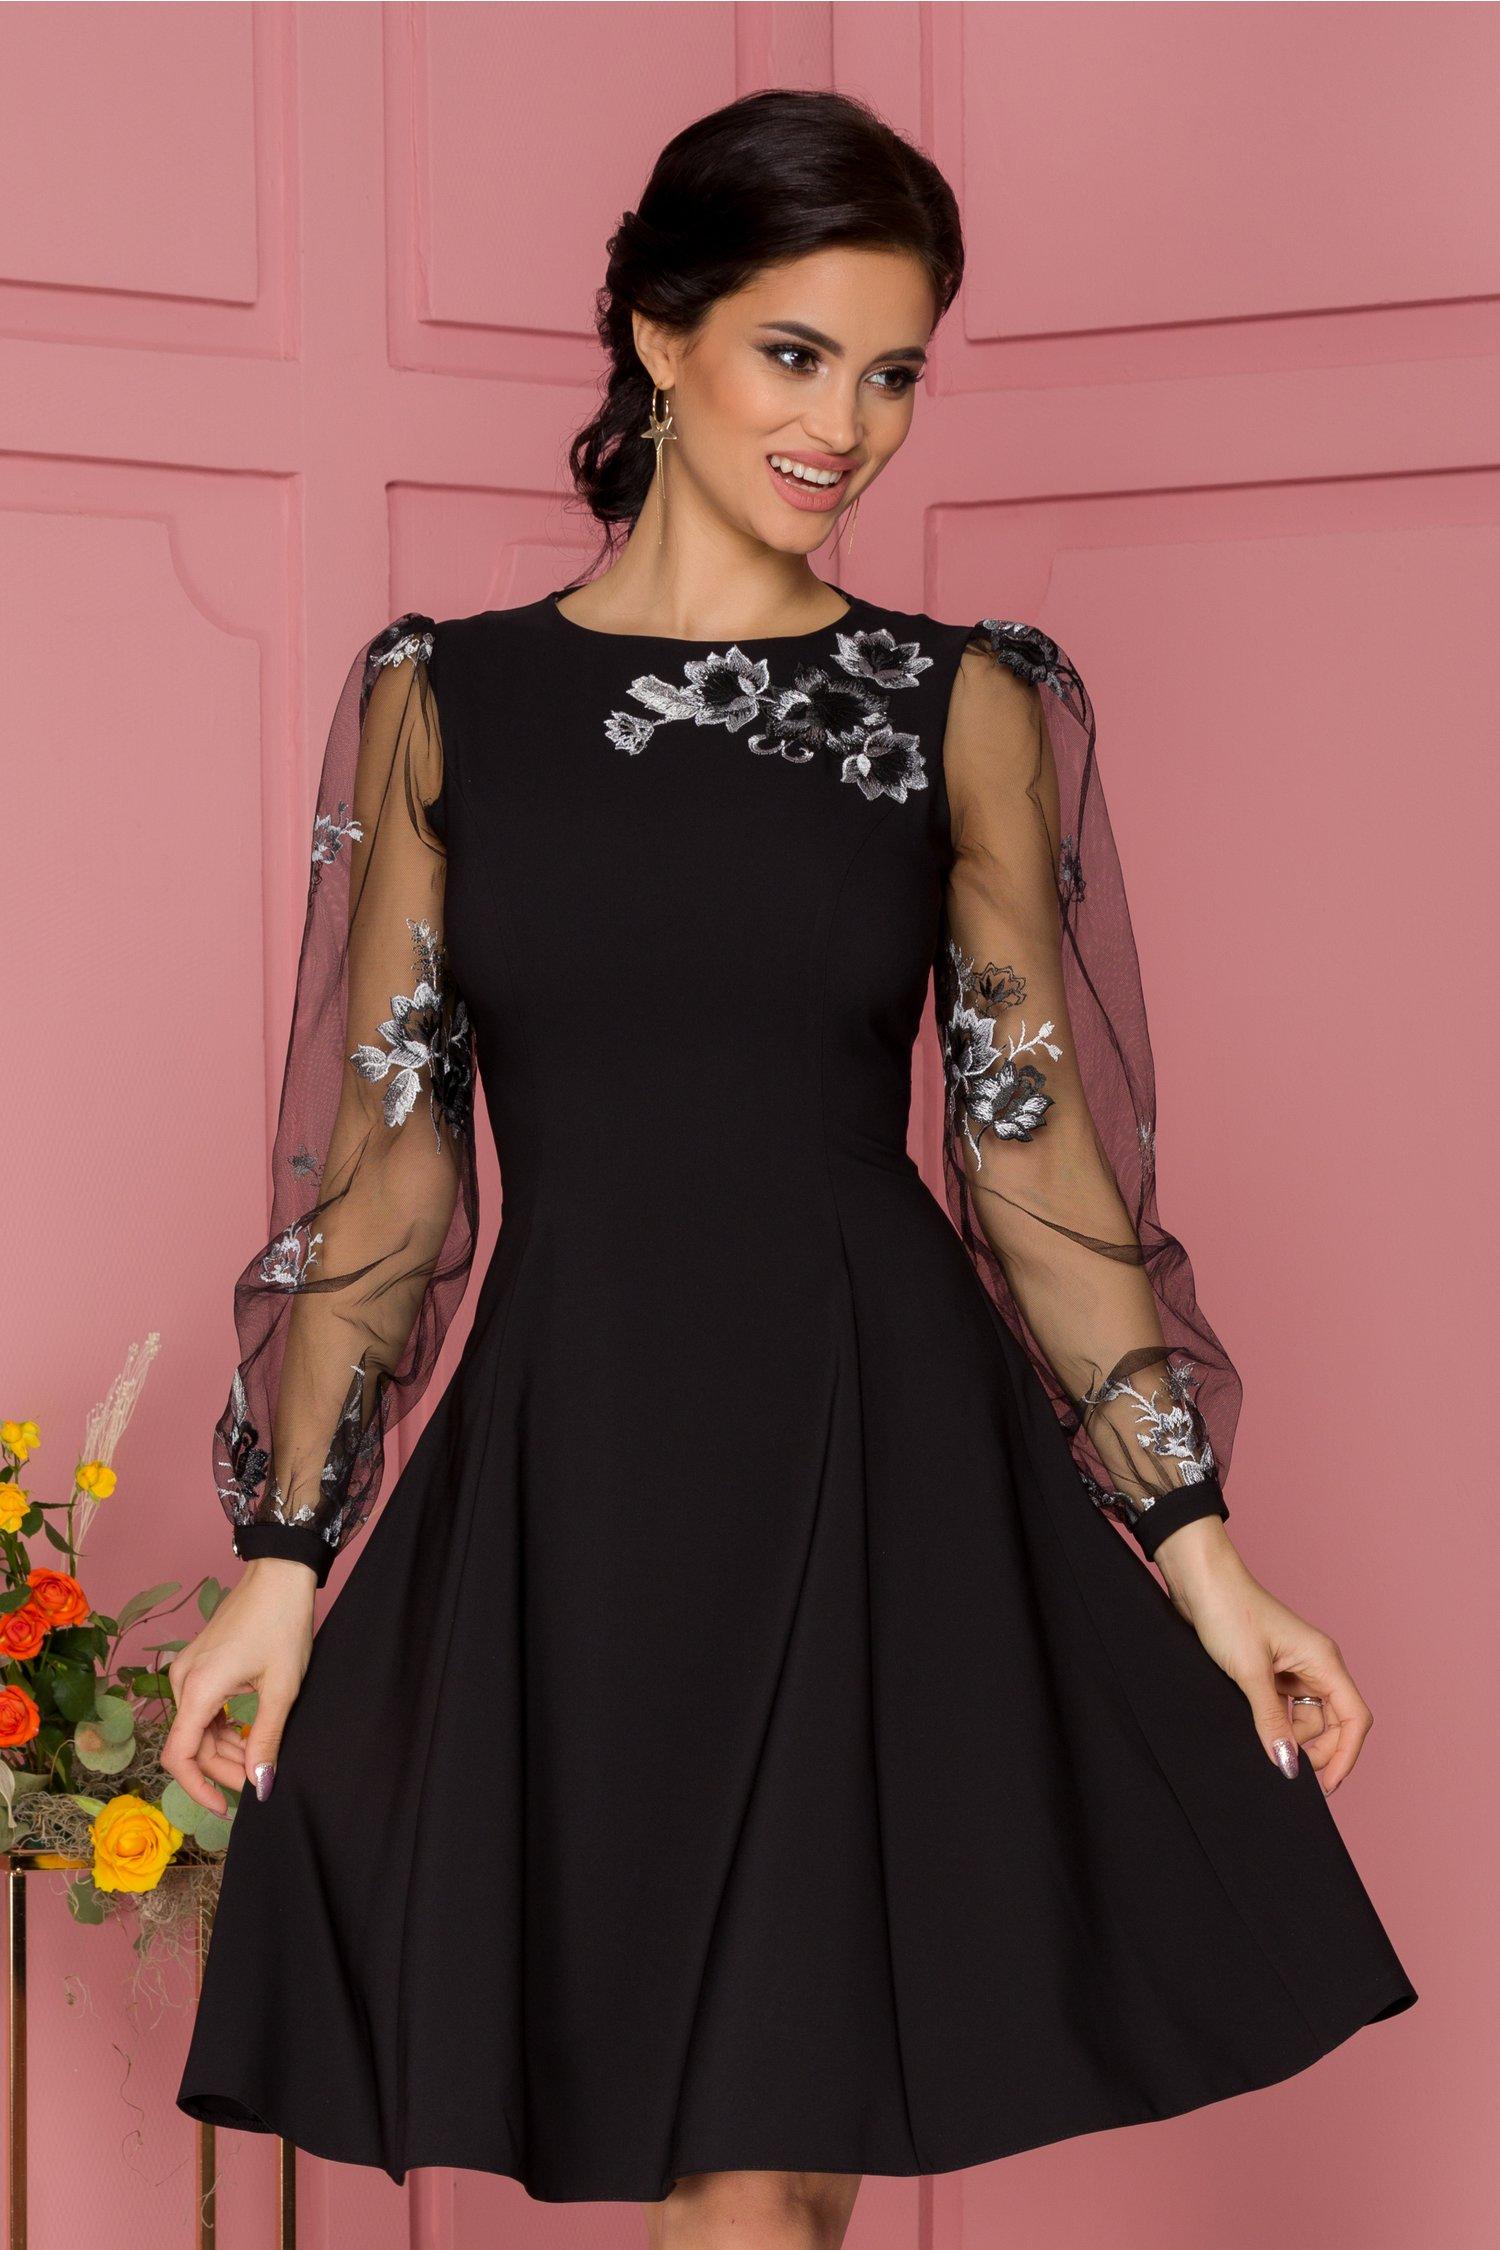 Rochie LaDonna neagra cu maneci din tull si broderie florala